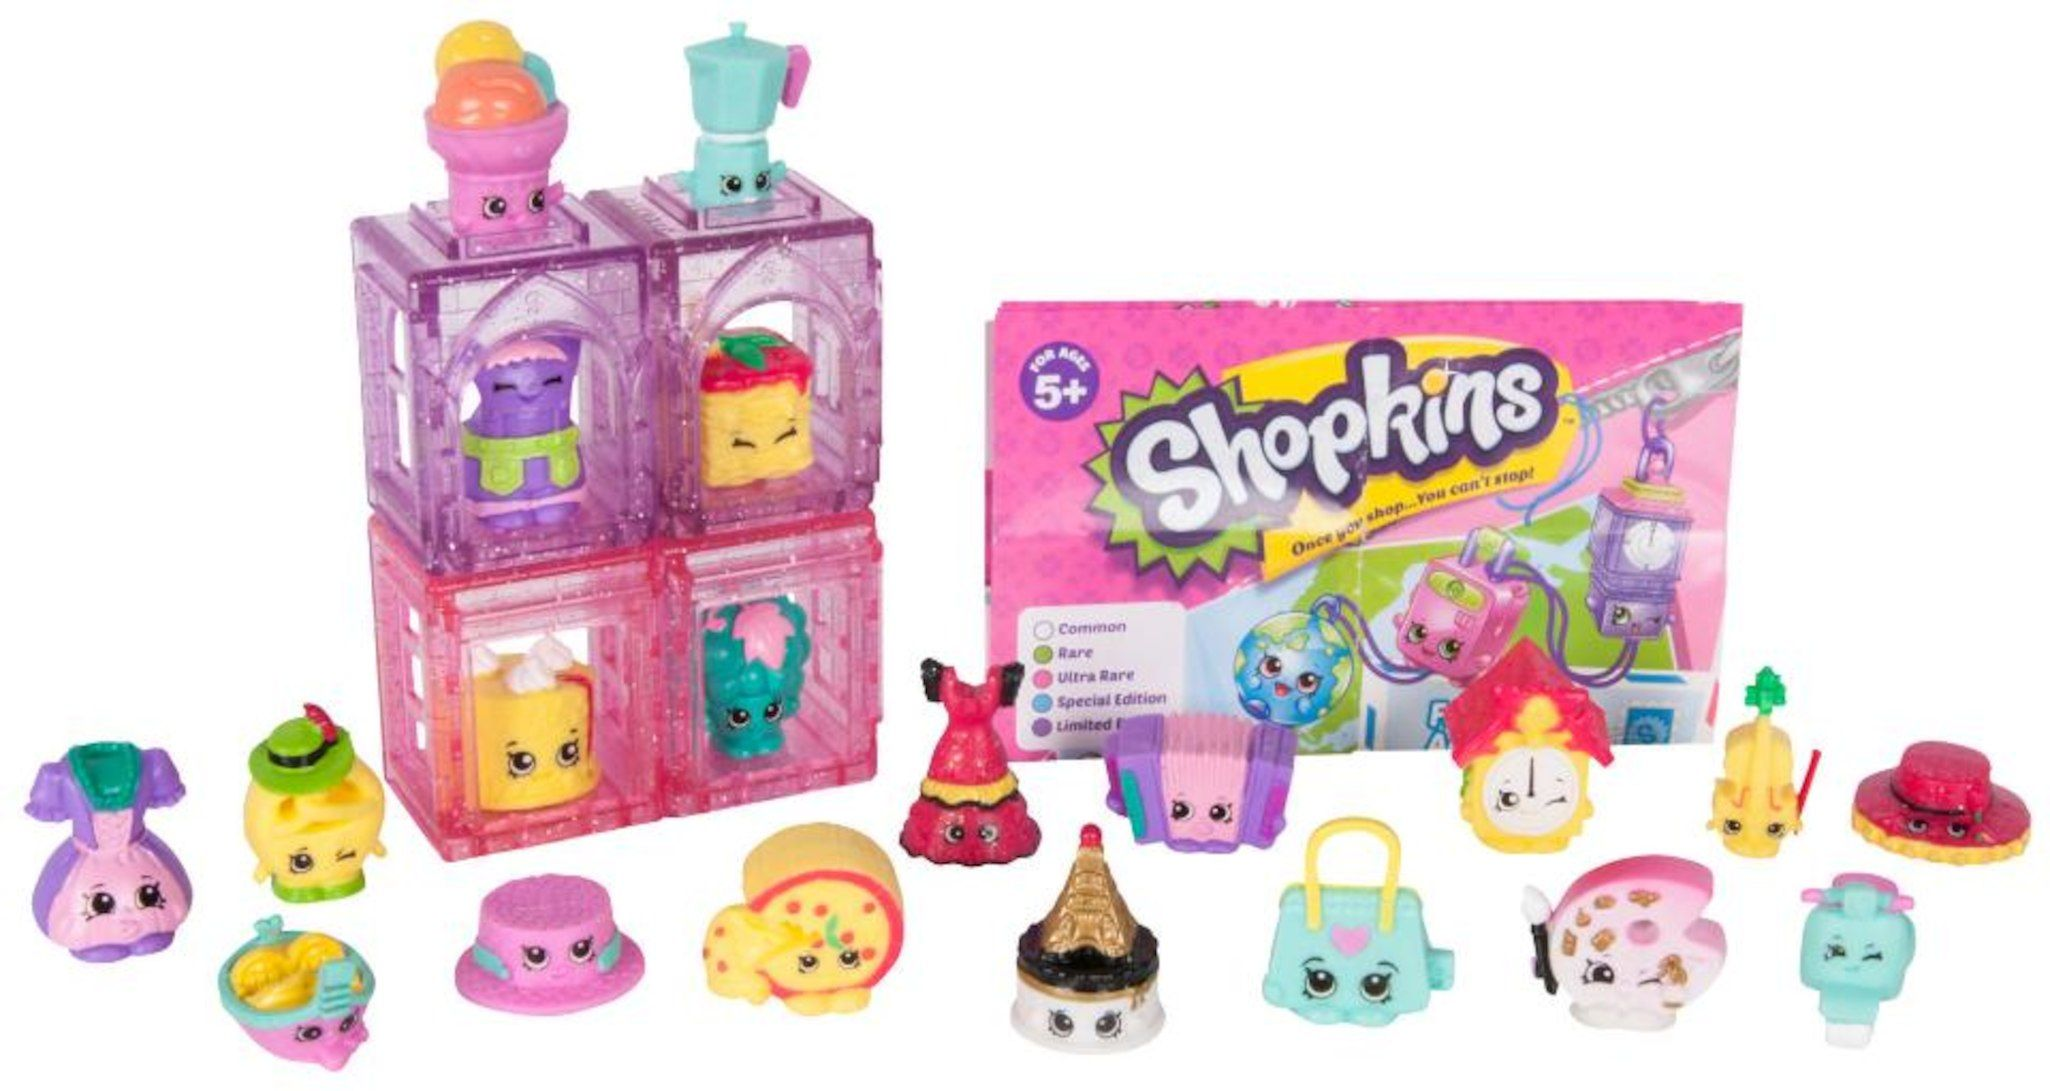 Bought Shopkins Season 8 World Vacation Boarding To Europe Mega Pack Adventure Time Merchandise Shopkins World Vacation Adventure Time